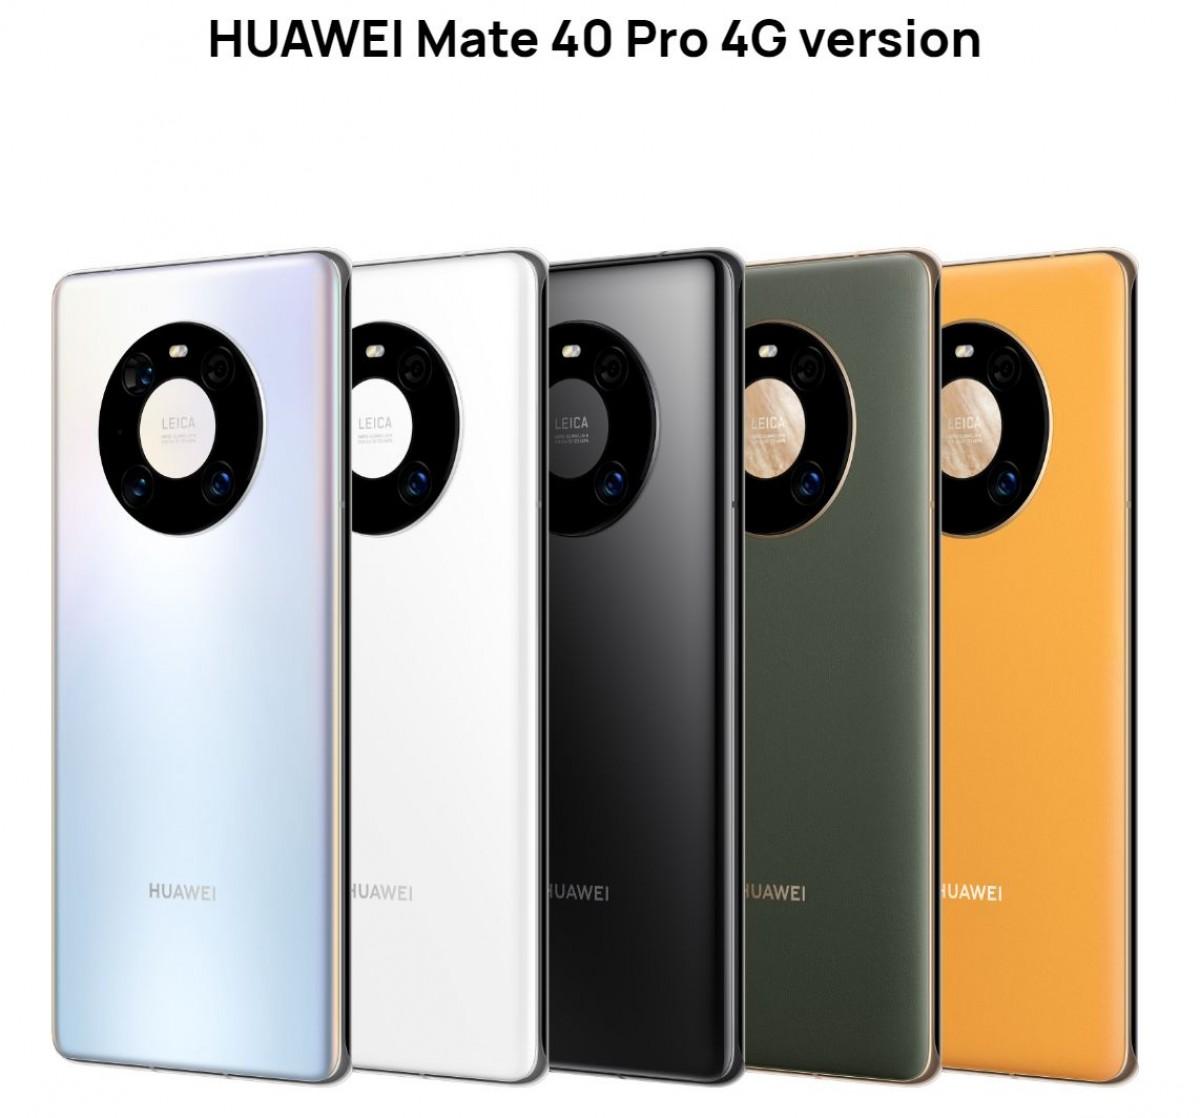 Huawei Mate 40 Pro 4G et Mate X2 4G arrivent en Chine